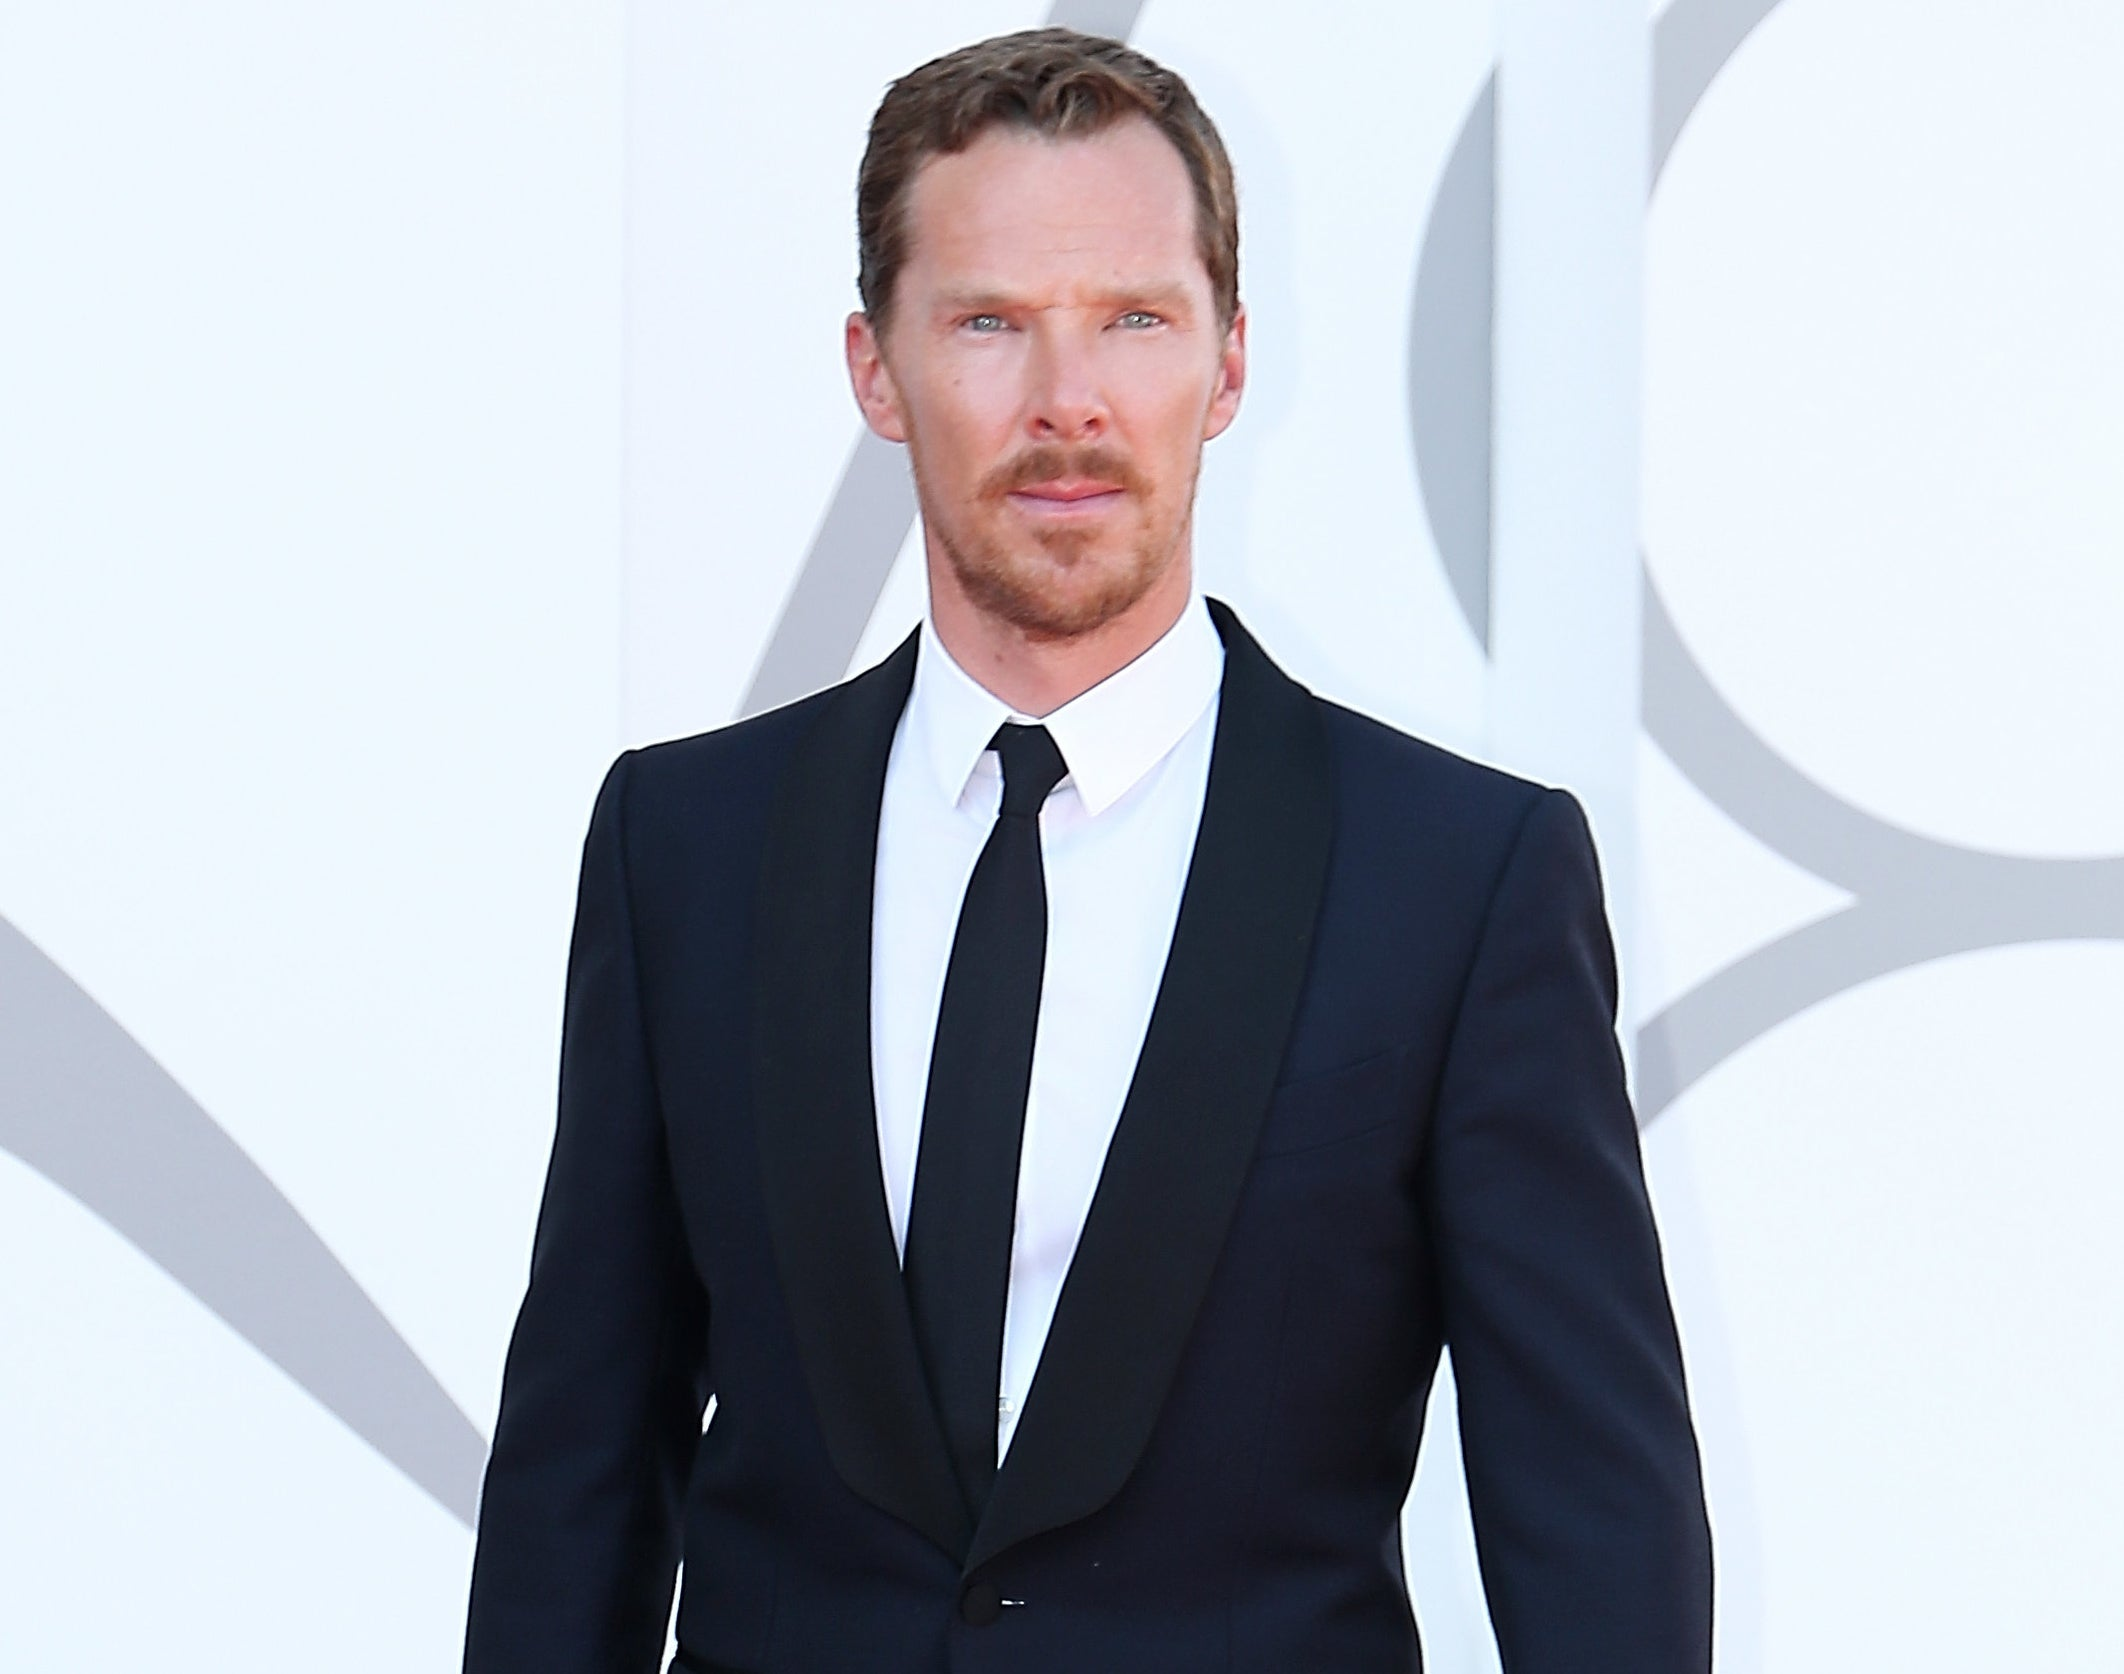 Benedict wears a black suit and skinny black tie